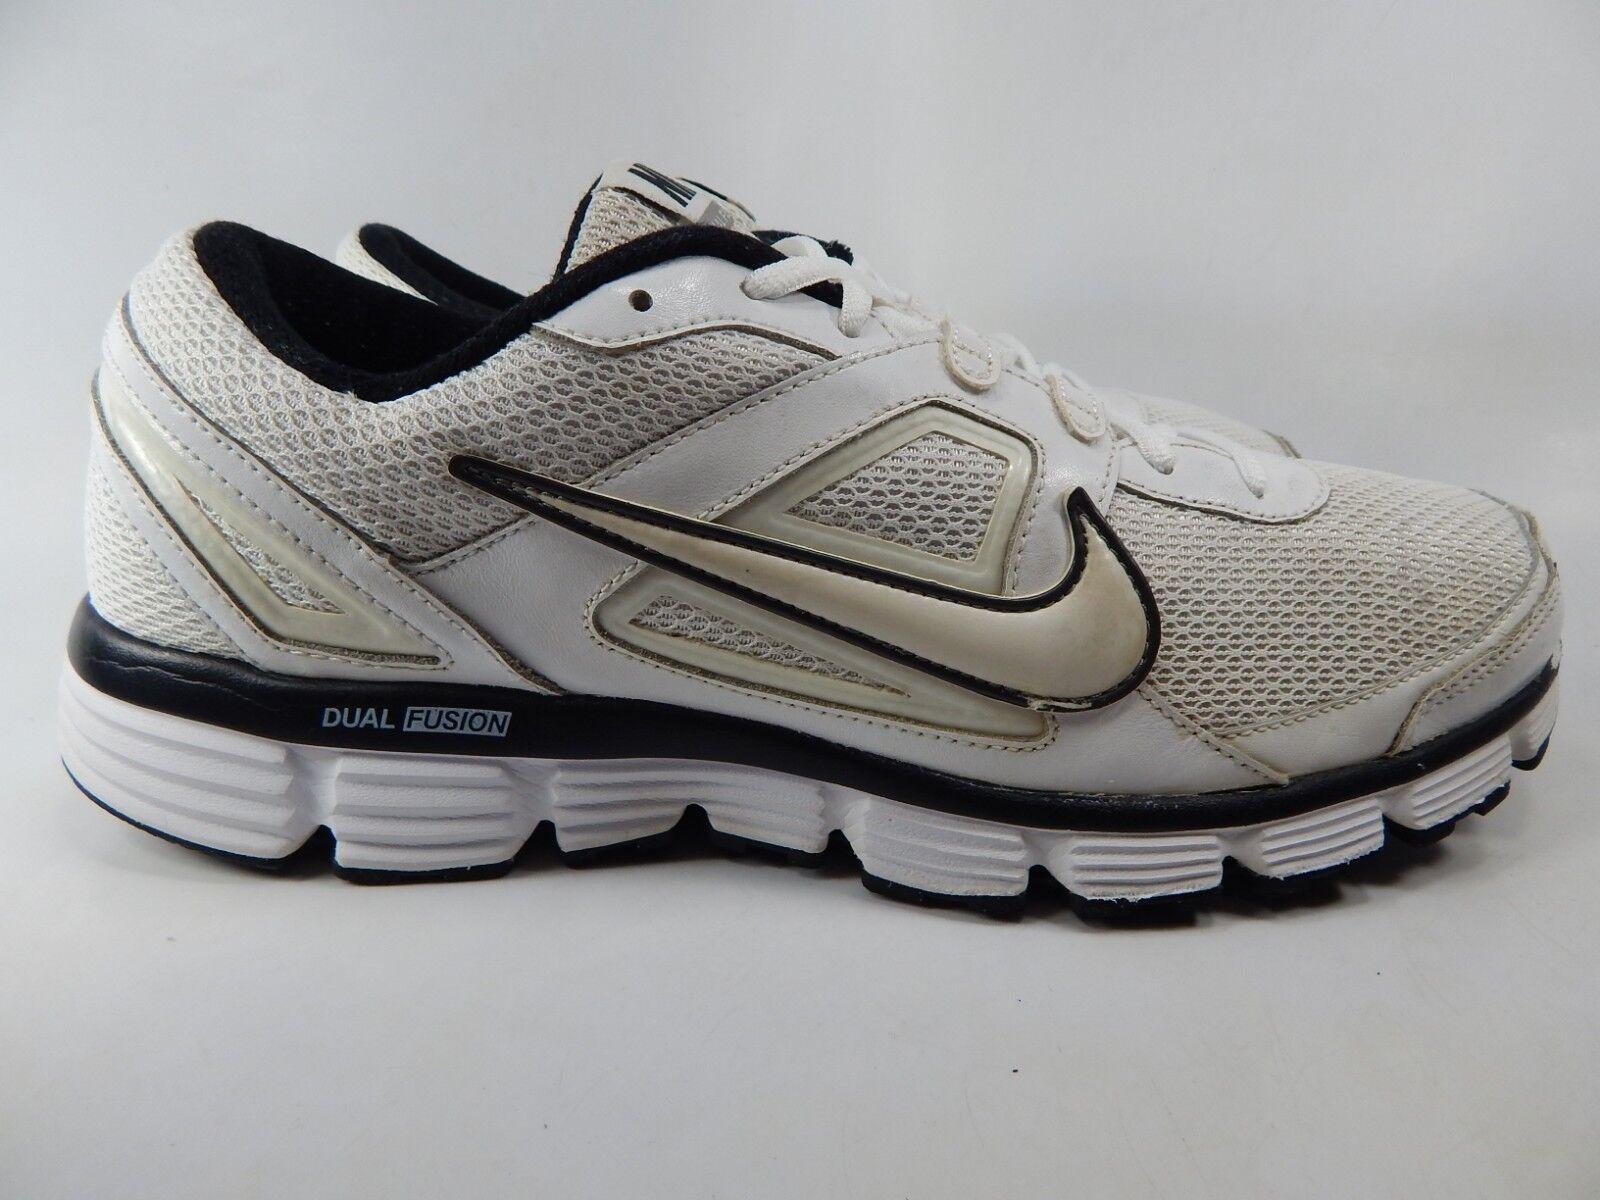 newest a1b87 1fd59 Nike Dual Fusion ST Size 13 EU 47.5 Men s Running shoes White 407853-103 M  (D) nkkvwi7451-Men s Trainers